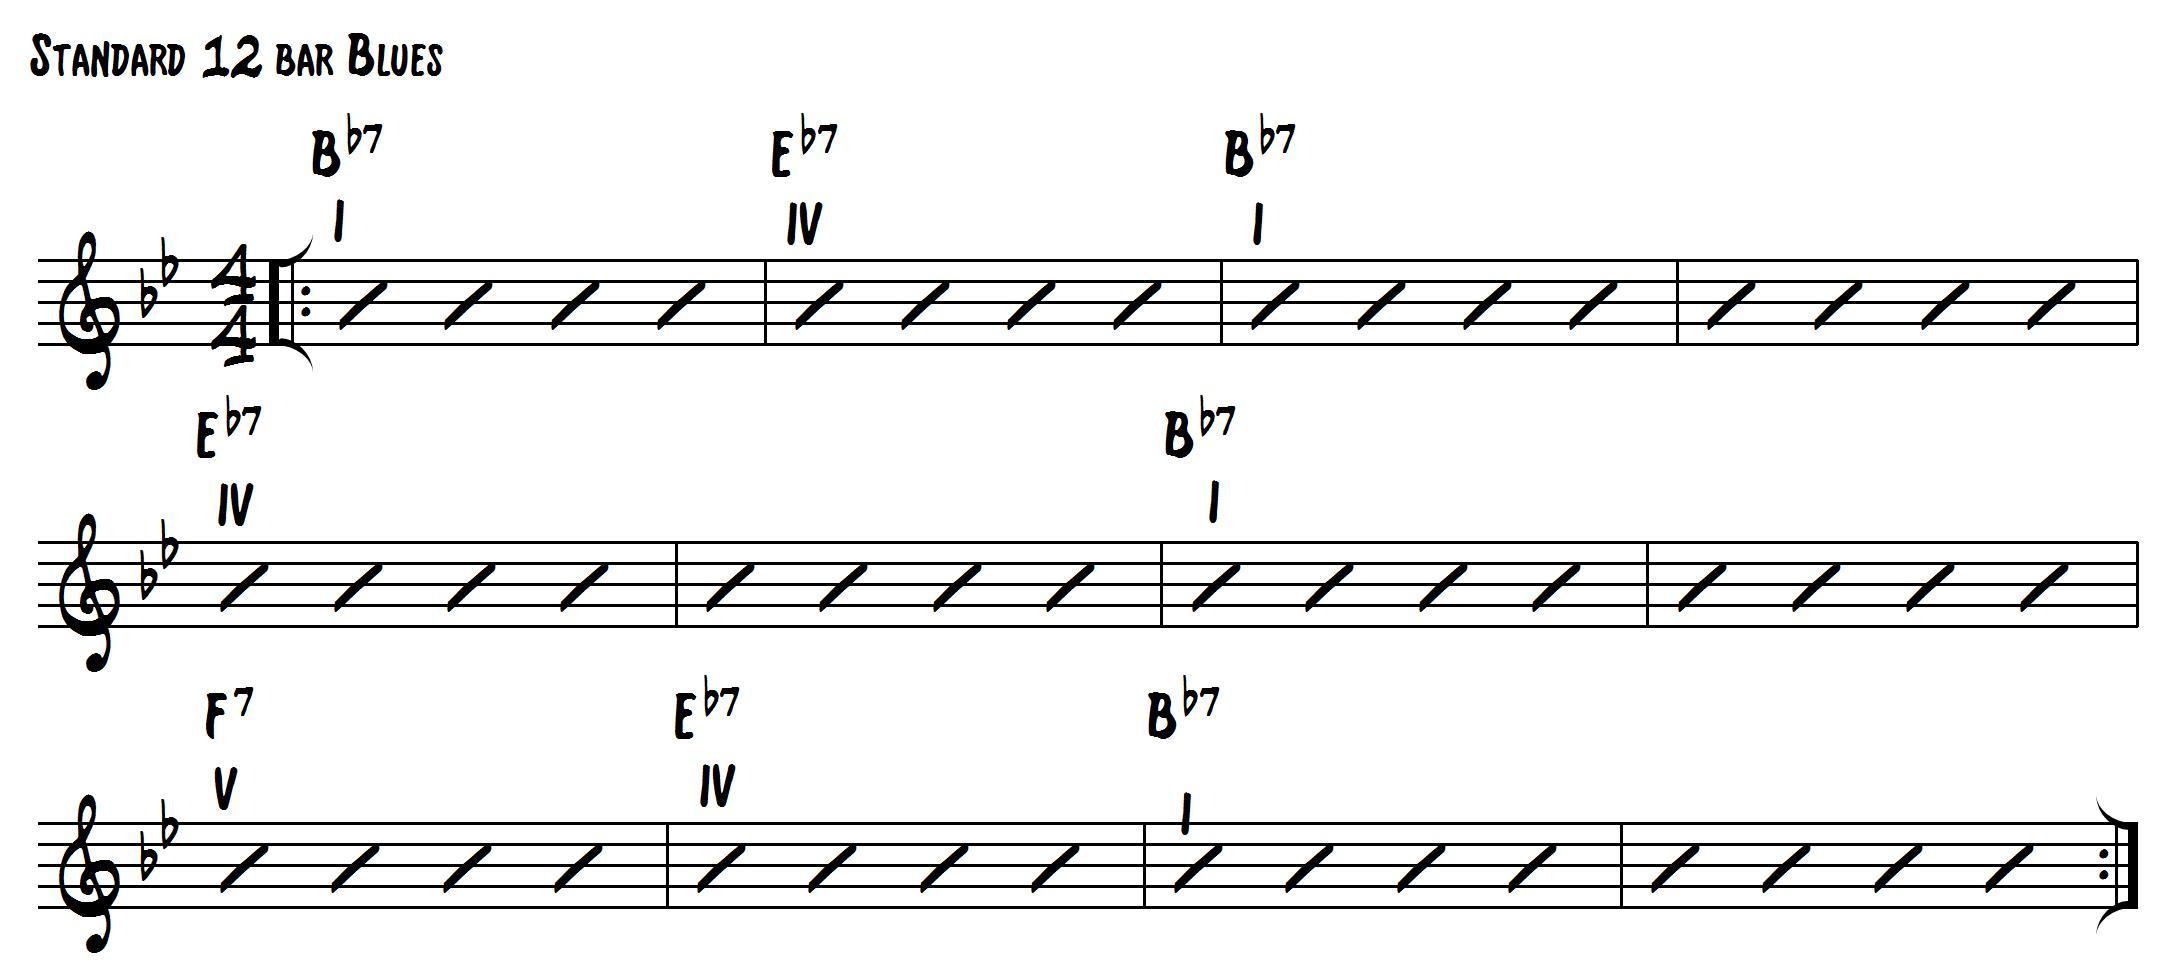 Standard 12 Bar Blues Roman Numeral